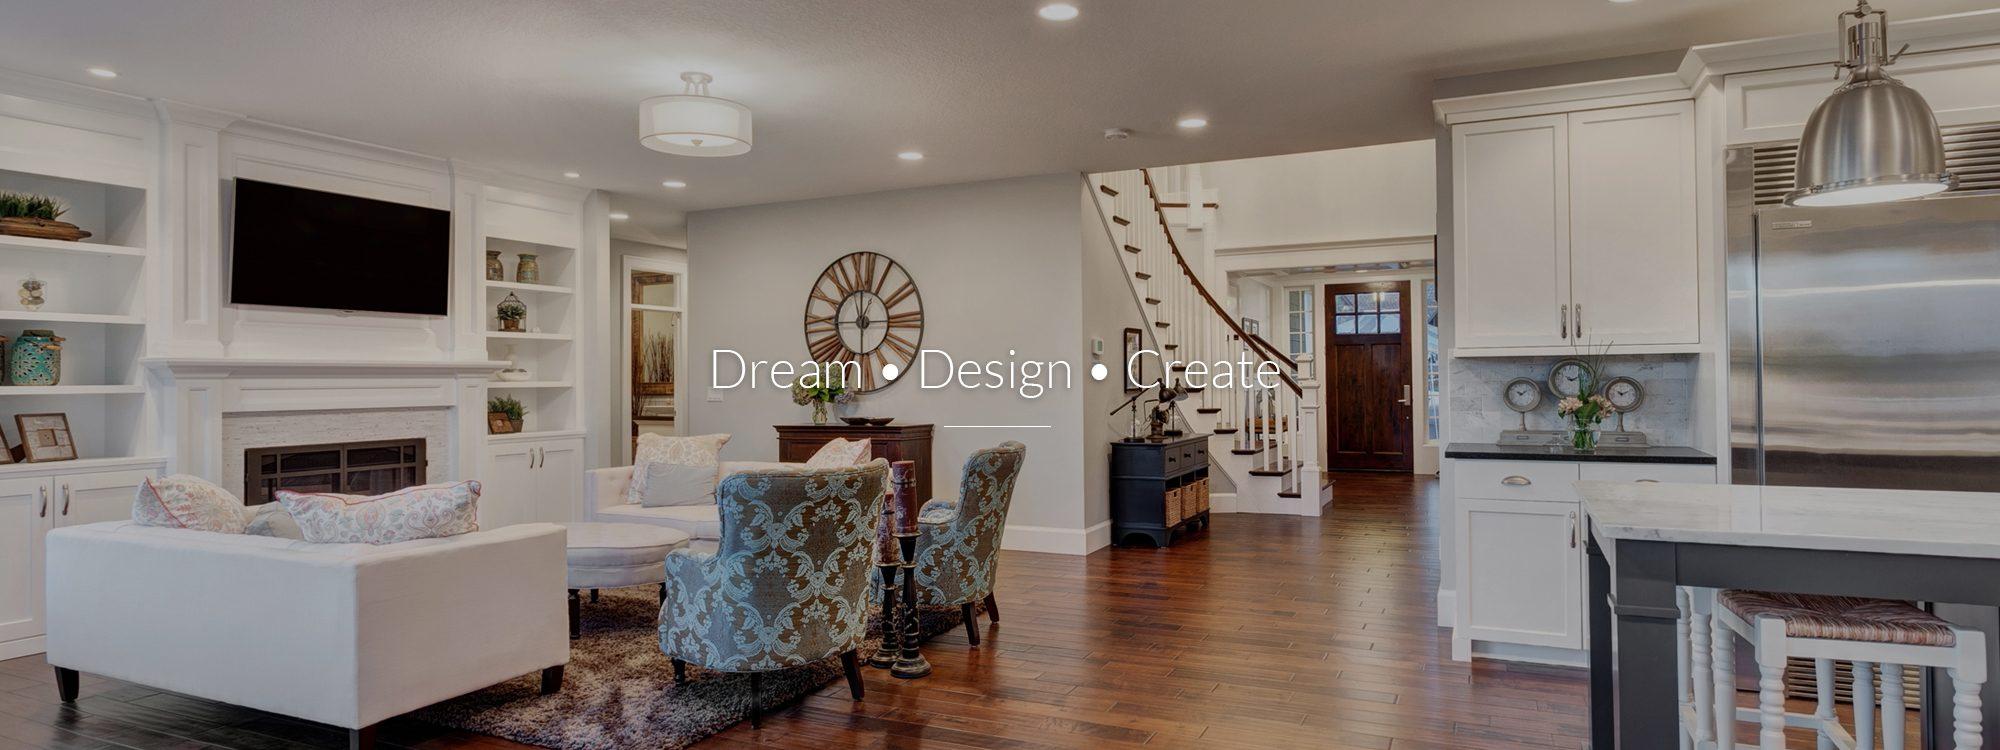 Best Home Expo Design Center Locations Pictures - Amazing Design ...